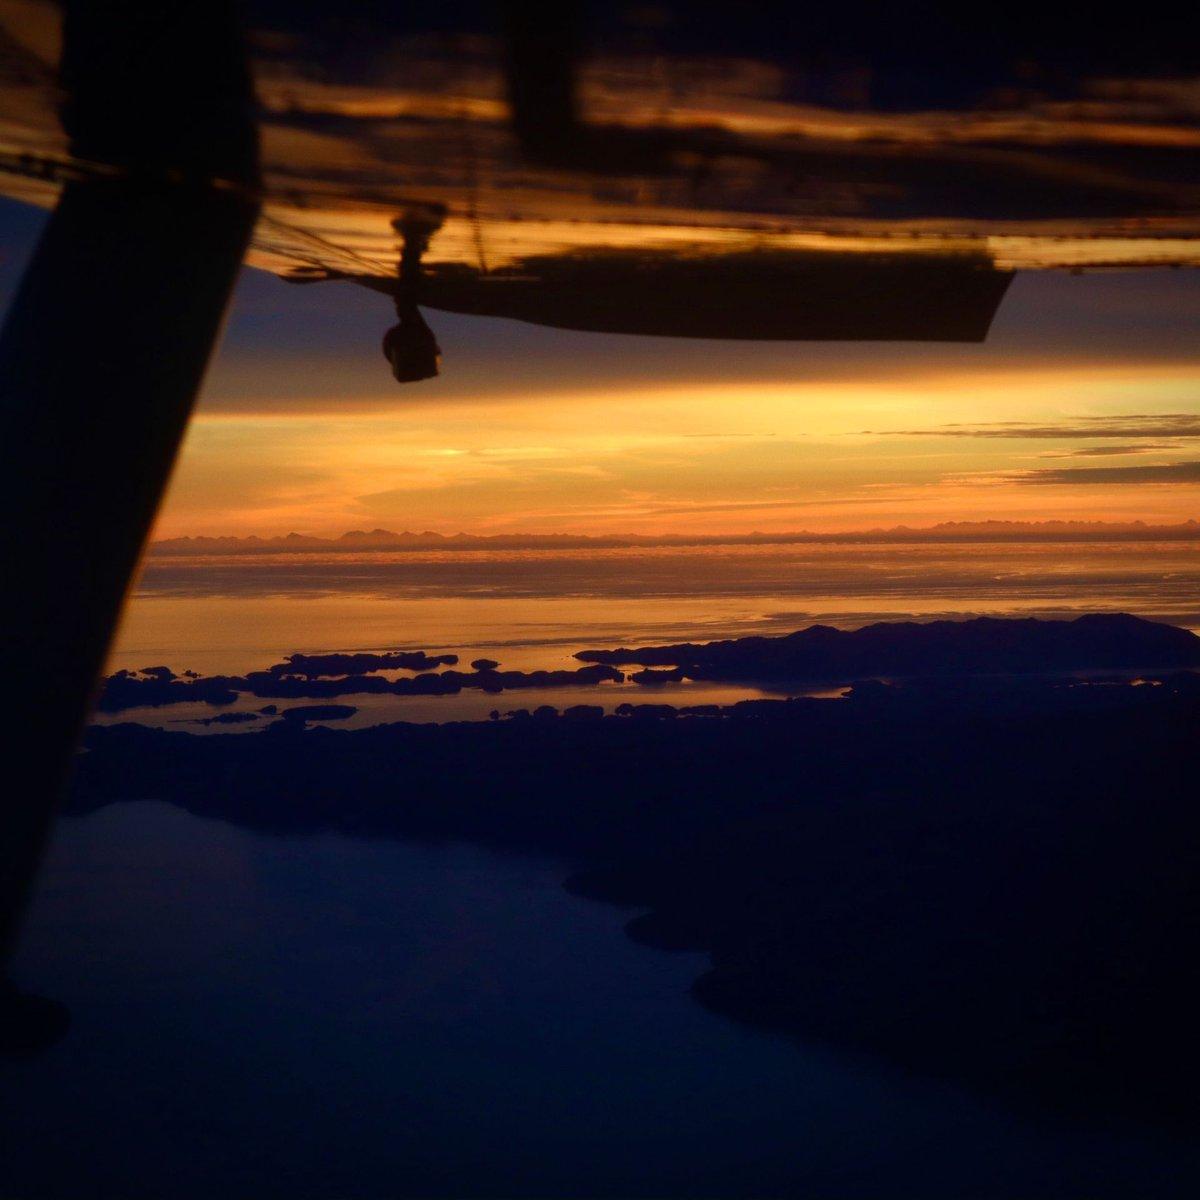 Happy #WingshotWednesday 🛫 #wsw  #AviatorTraining #avgeek #aviation #flying #airplanelovers #aviator #airplane_lovers #airplane #pilot #aircraft #pilotlife #learntofly  #CFI #CFILife  #PilotYourOwnAdventure #airport #travel #flighttraining #wanderlust #sharingalaska https://t.co/kr2tGxRkwl